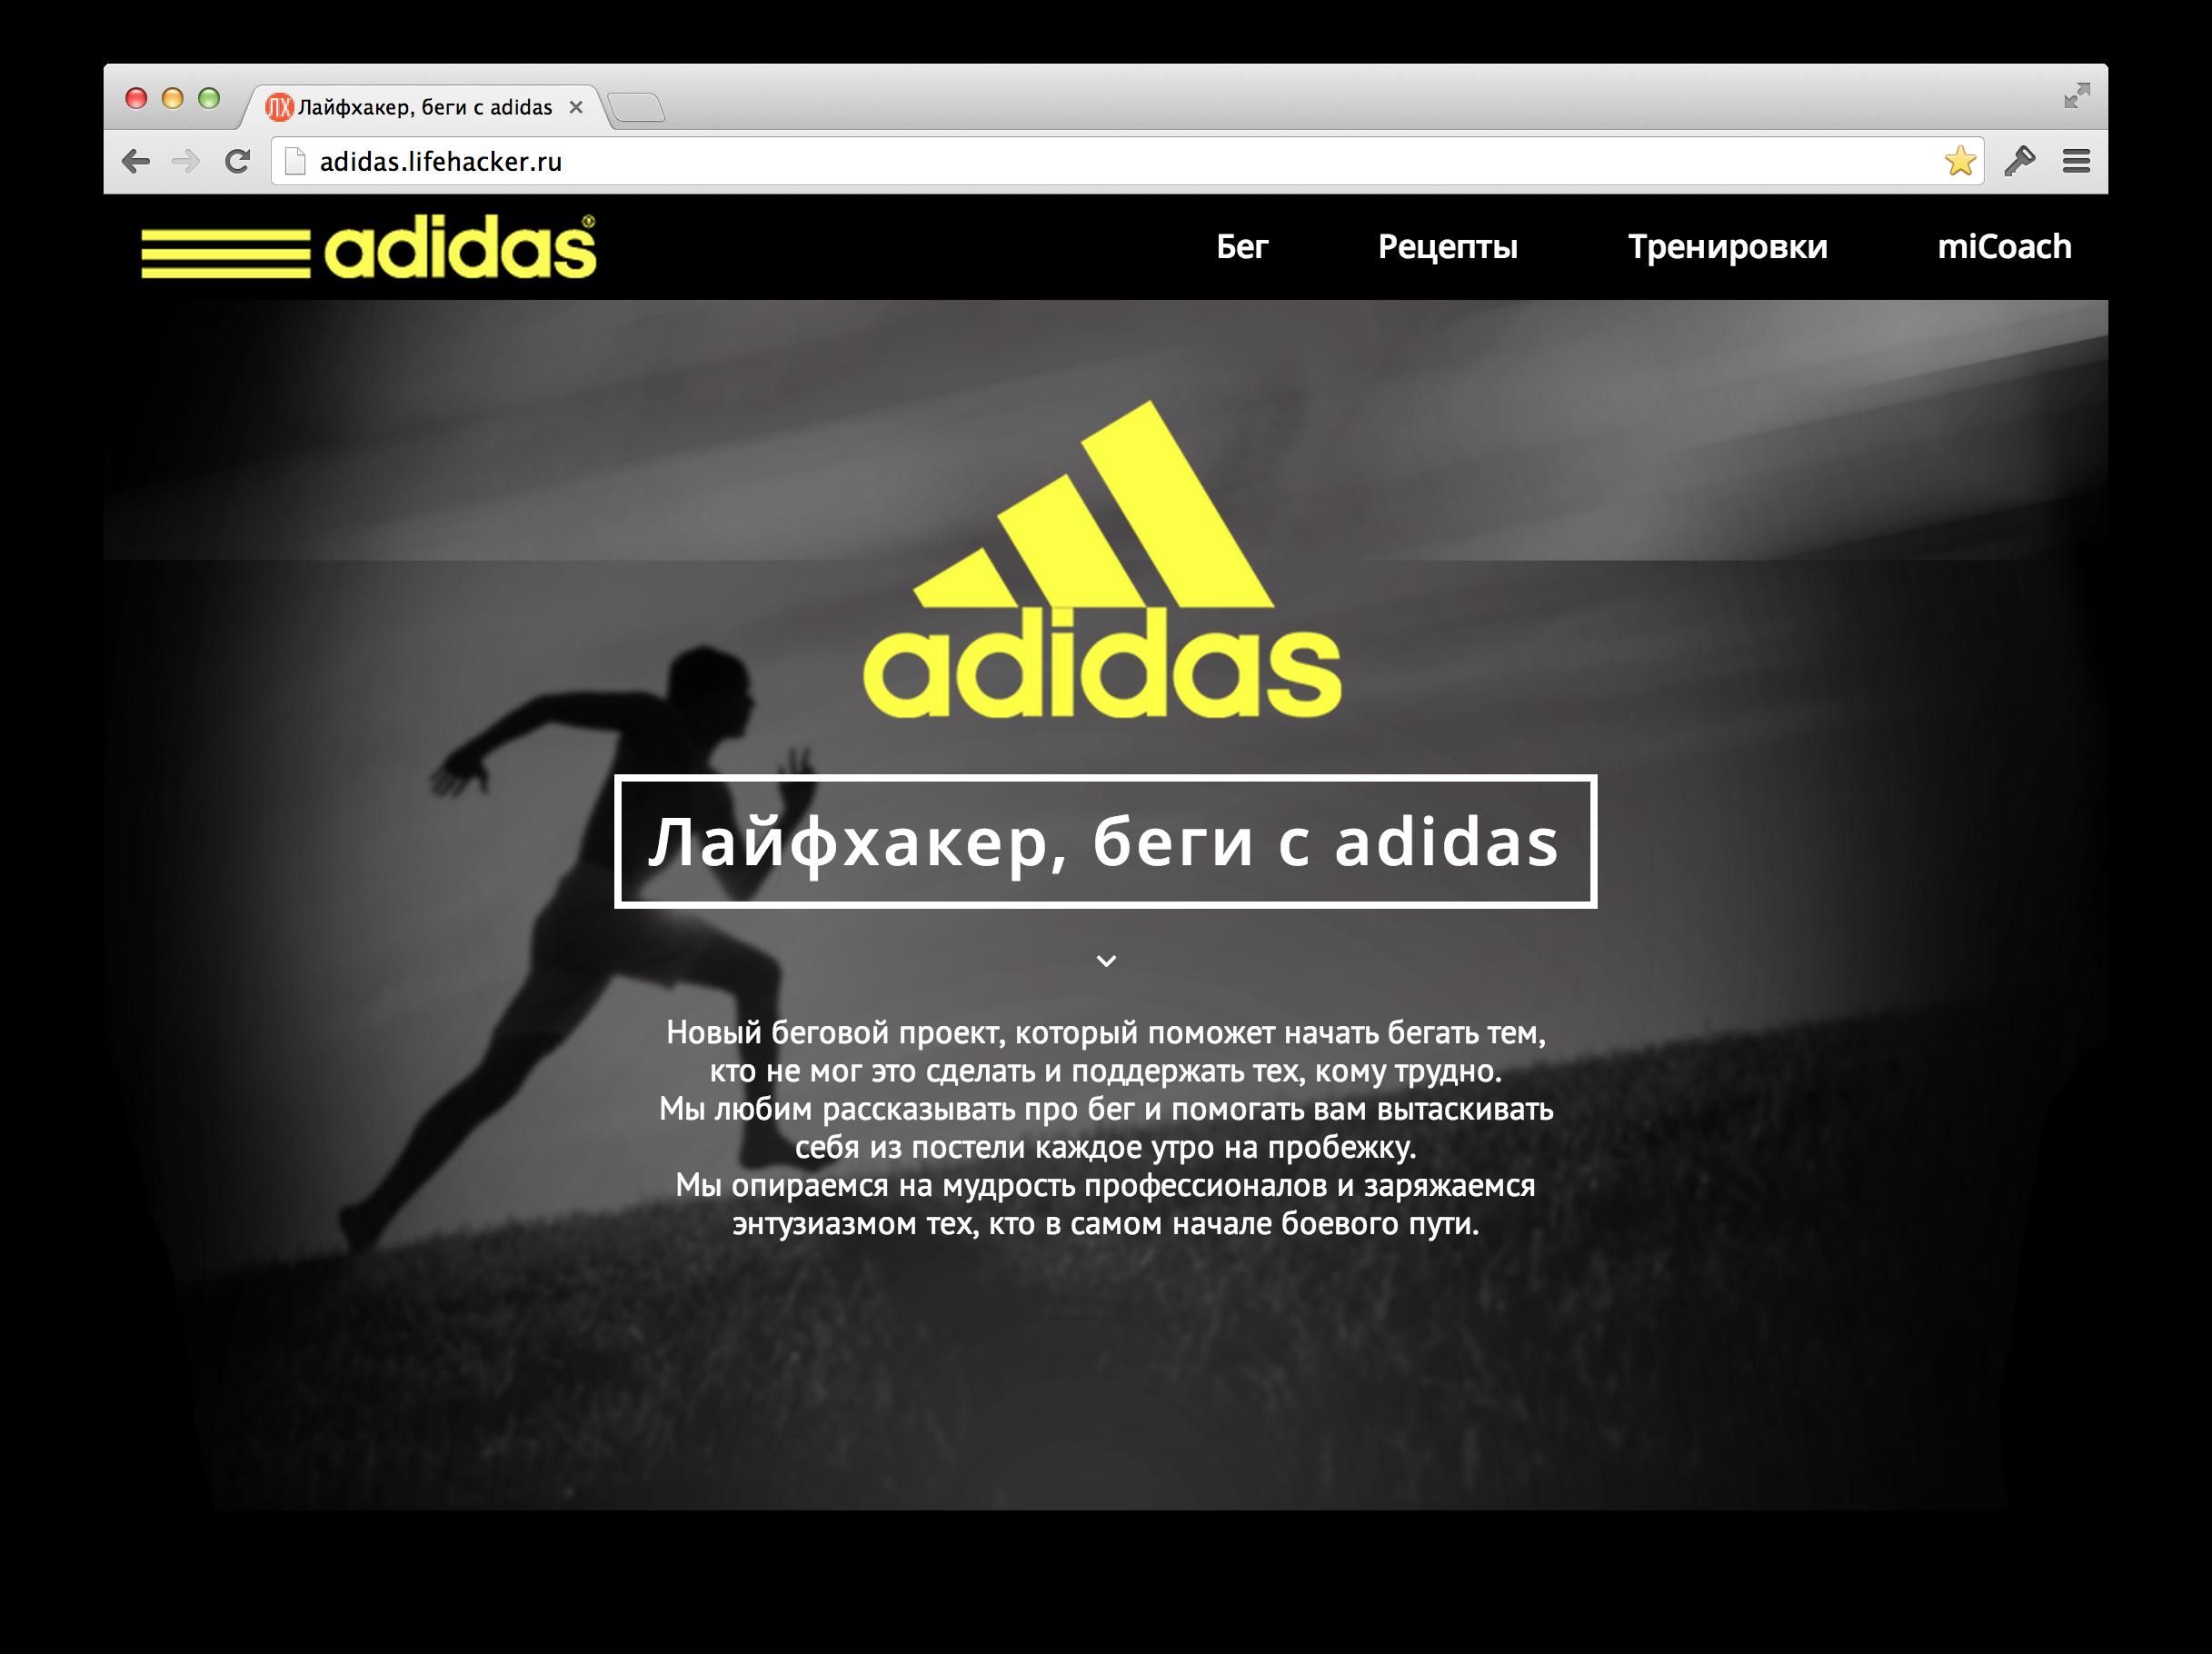 АНОНС: «Лайфхакер, беги с adidas» 2.0